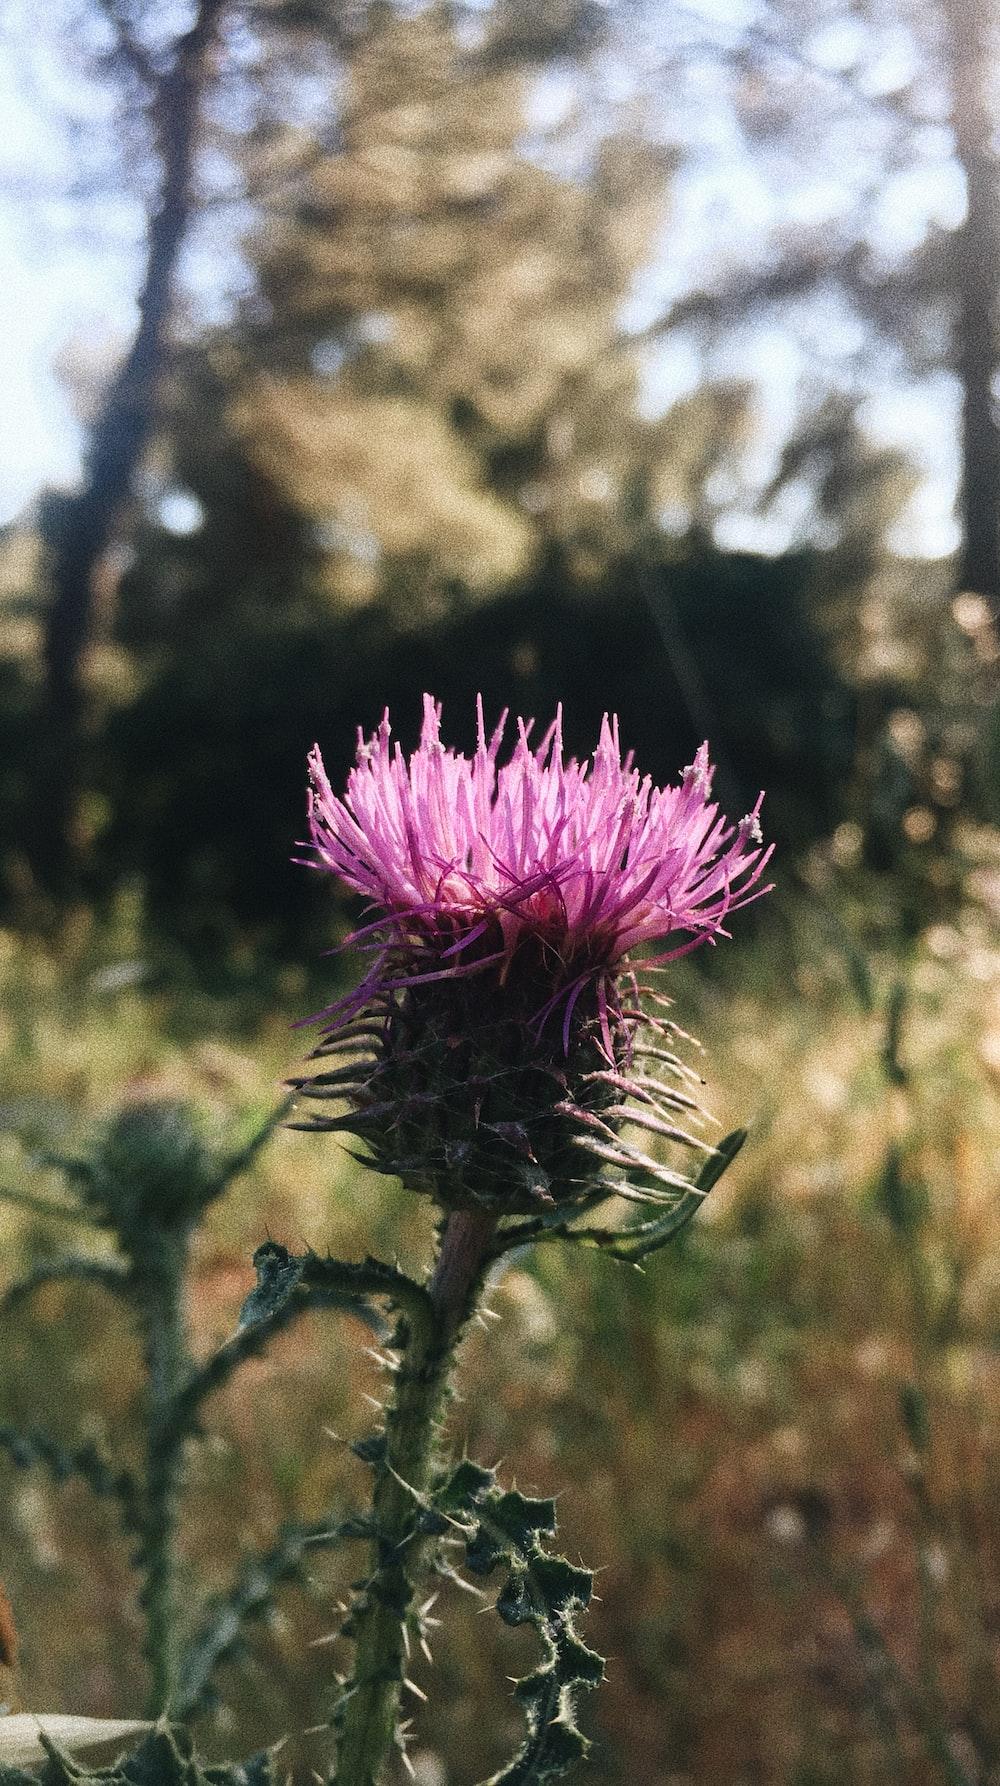 purple-petaled flower selective focus photography